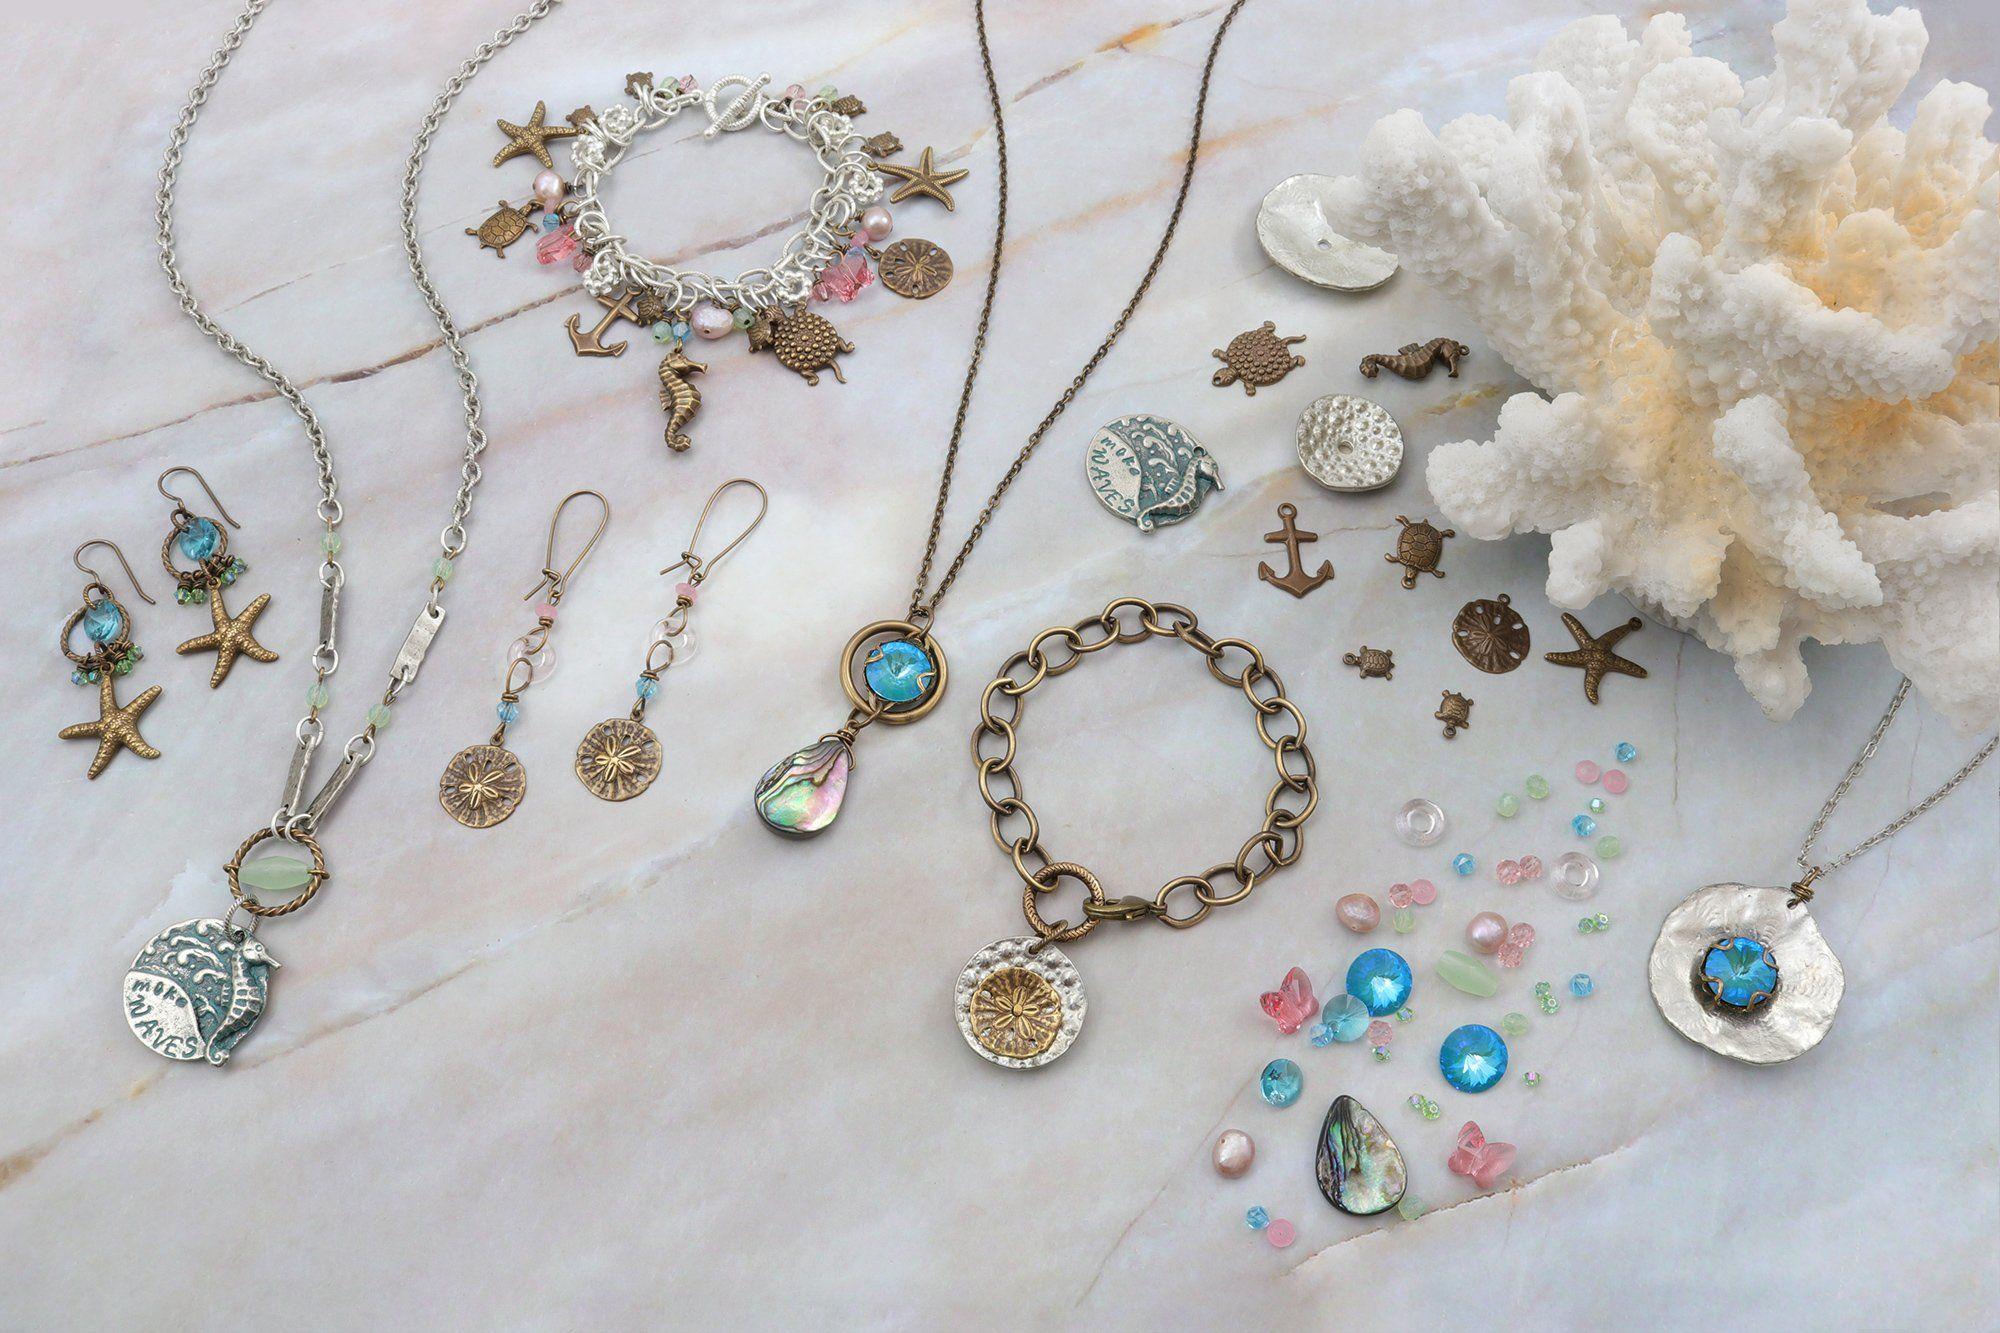 35++ Buy jewelry from costa rica ideas